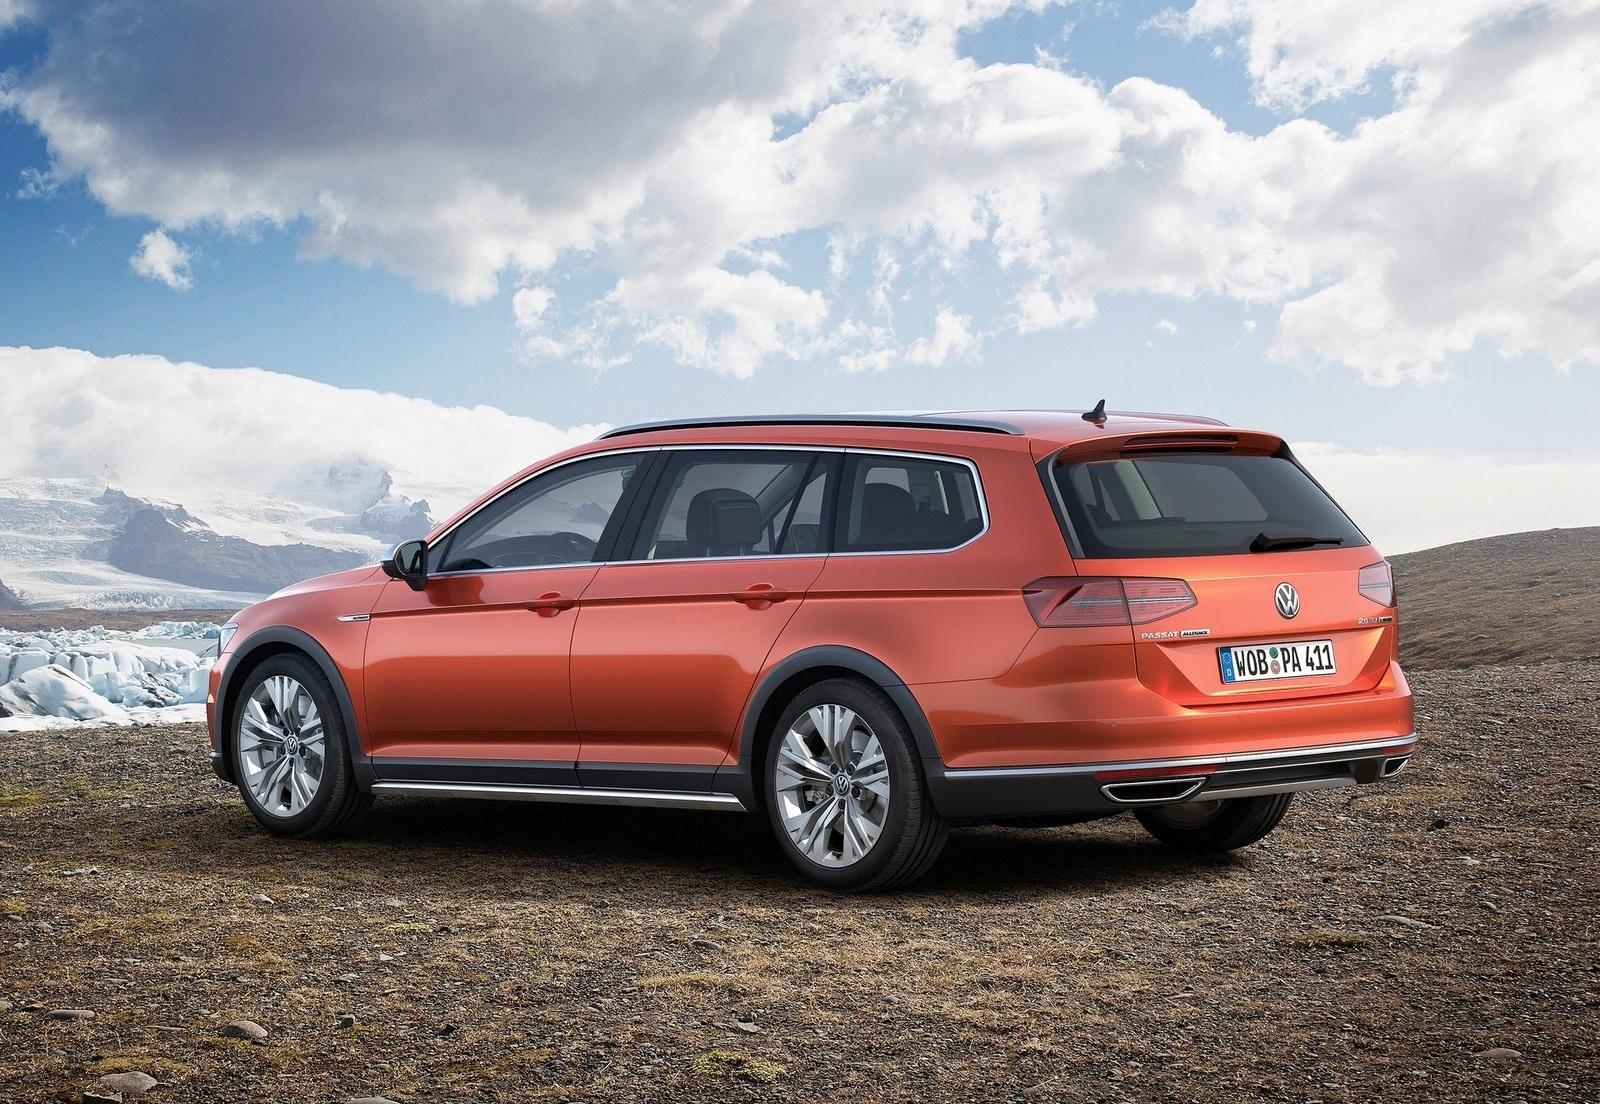 2016 Volkswagen Passat Alltrack Left Side Preview (Photo 10 of 18)